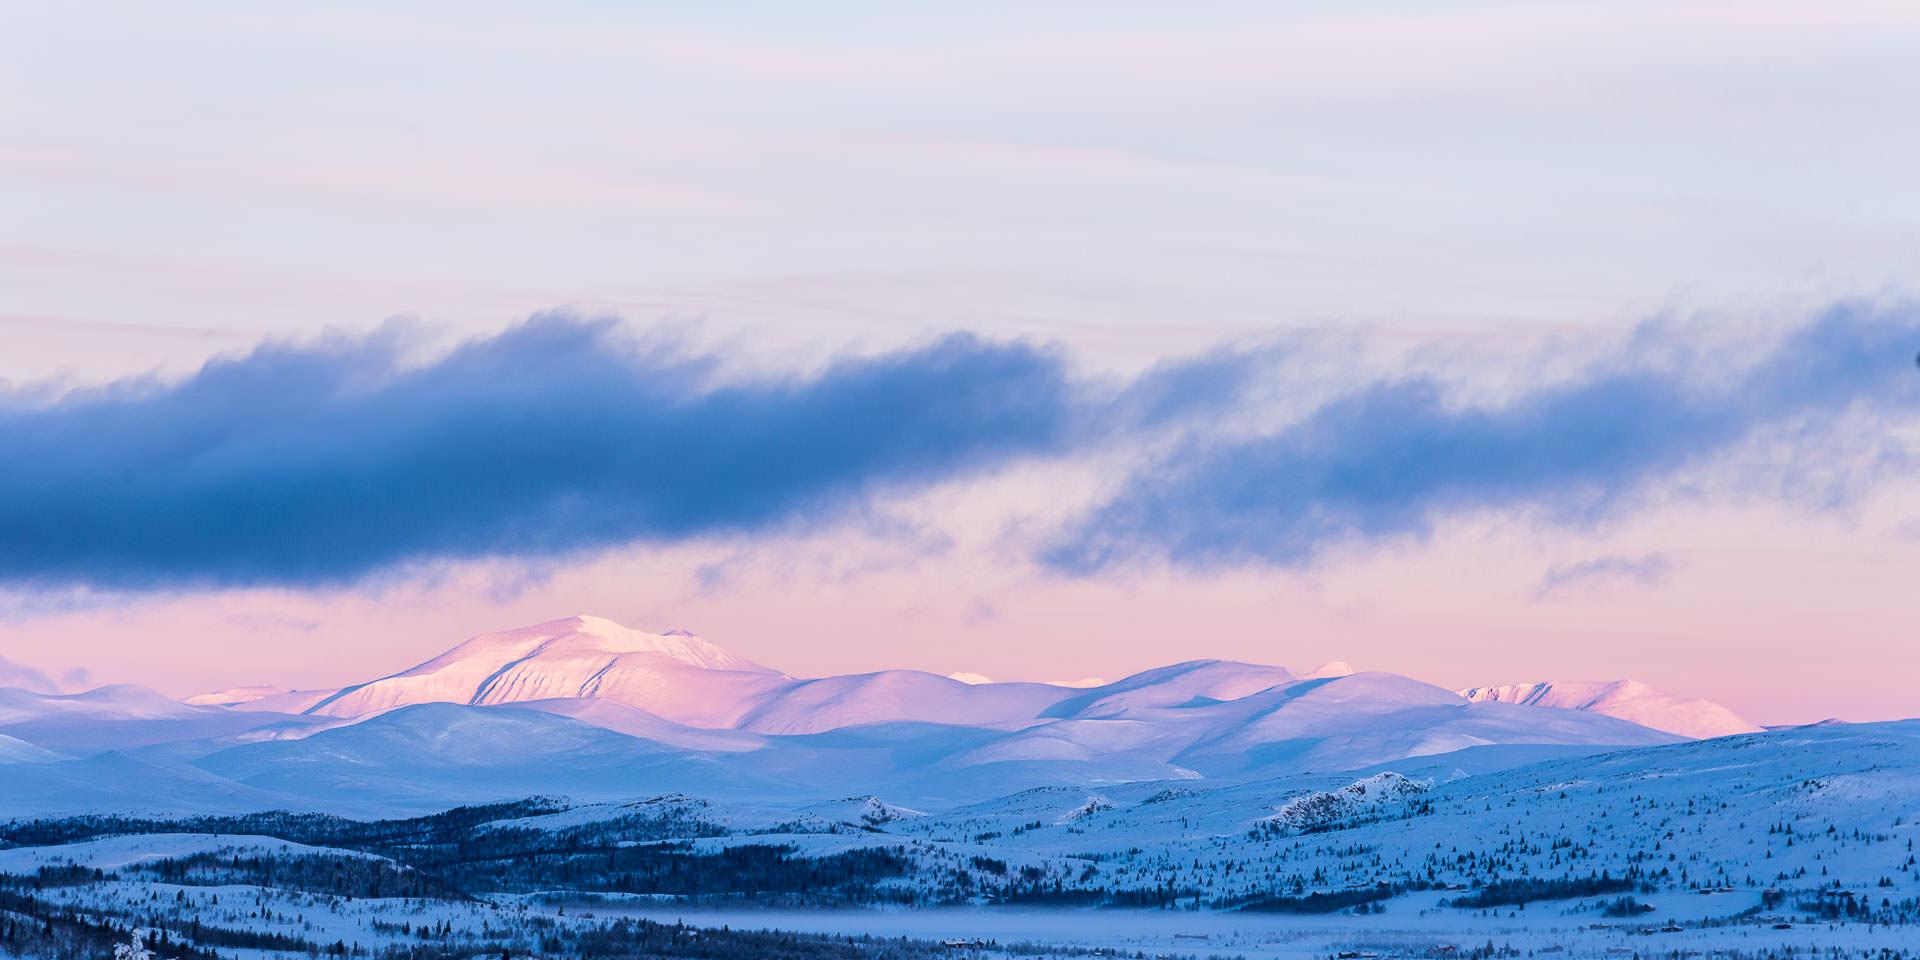 Rondane Venabygdsfjellet